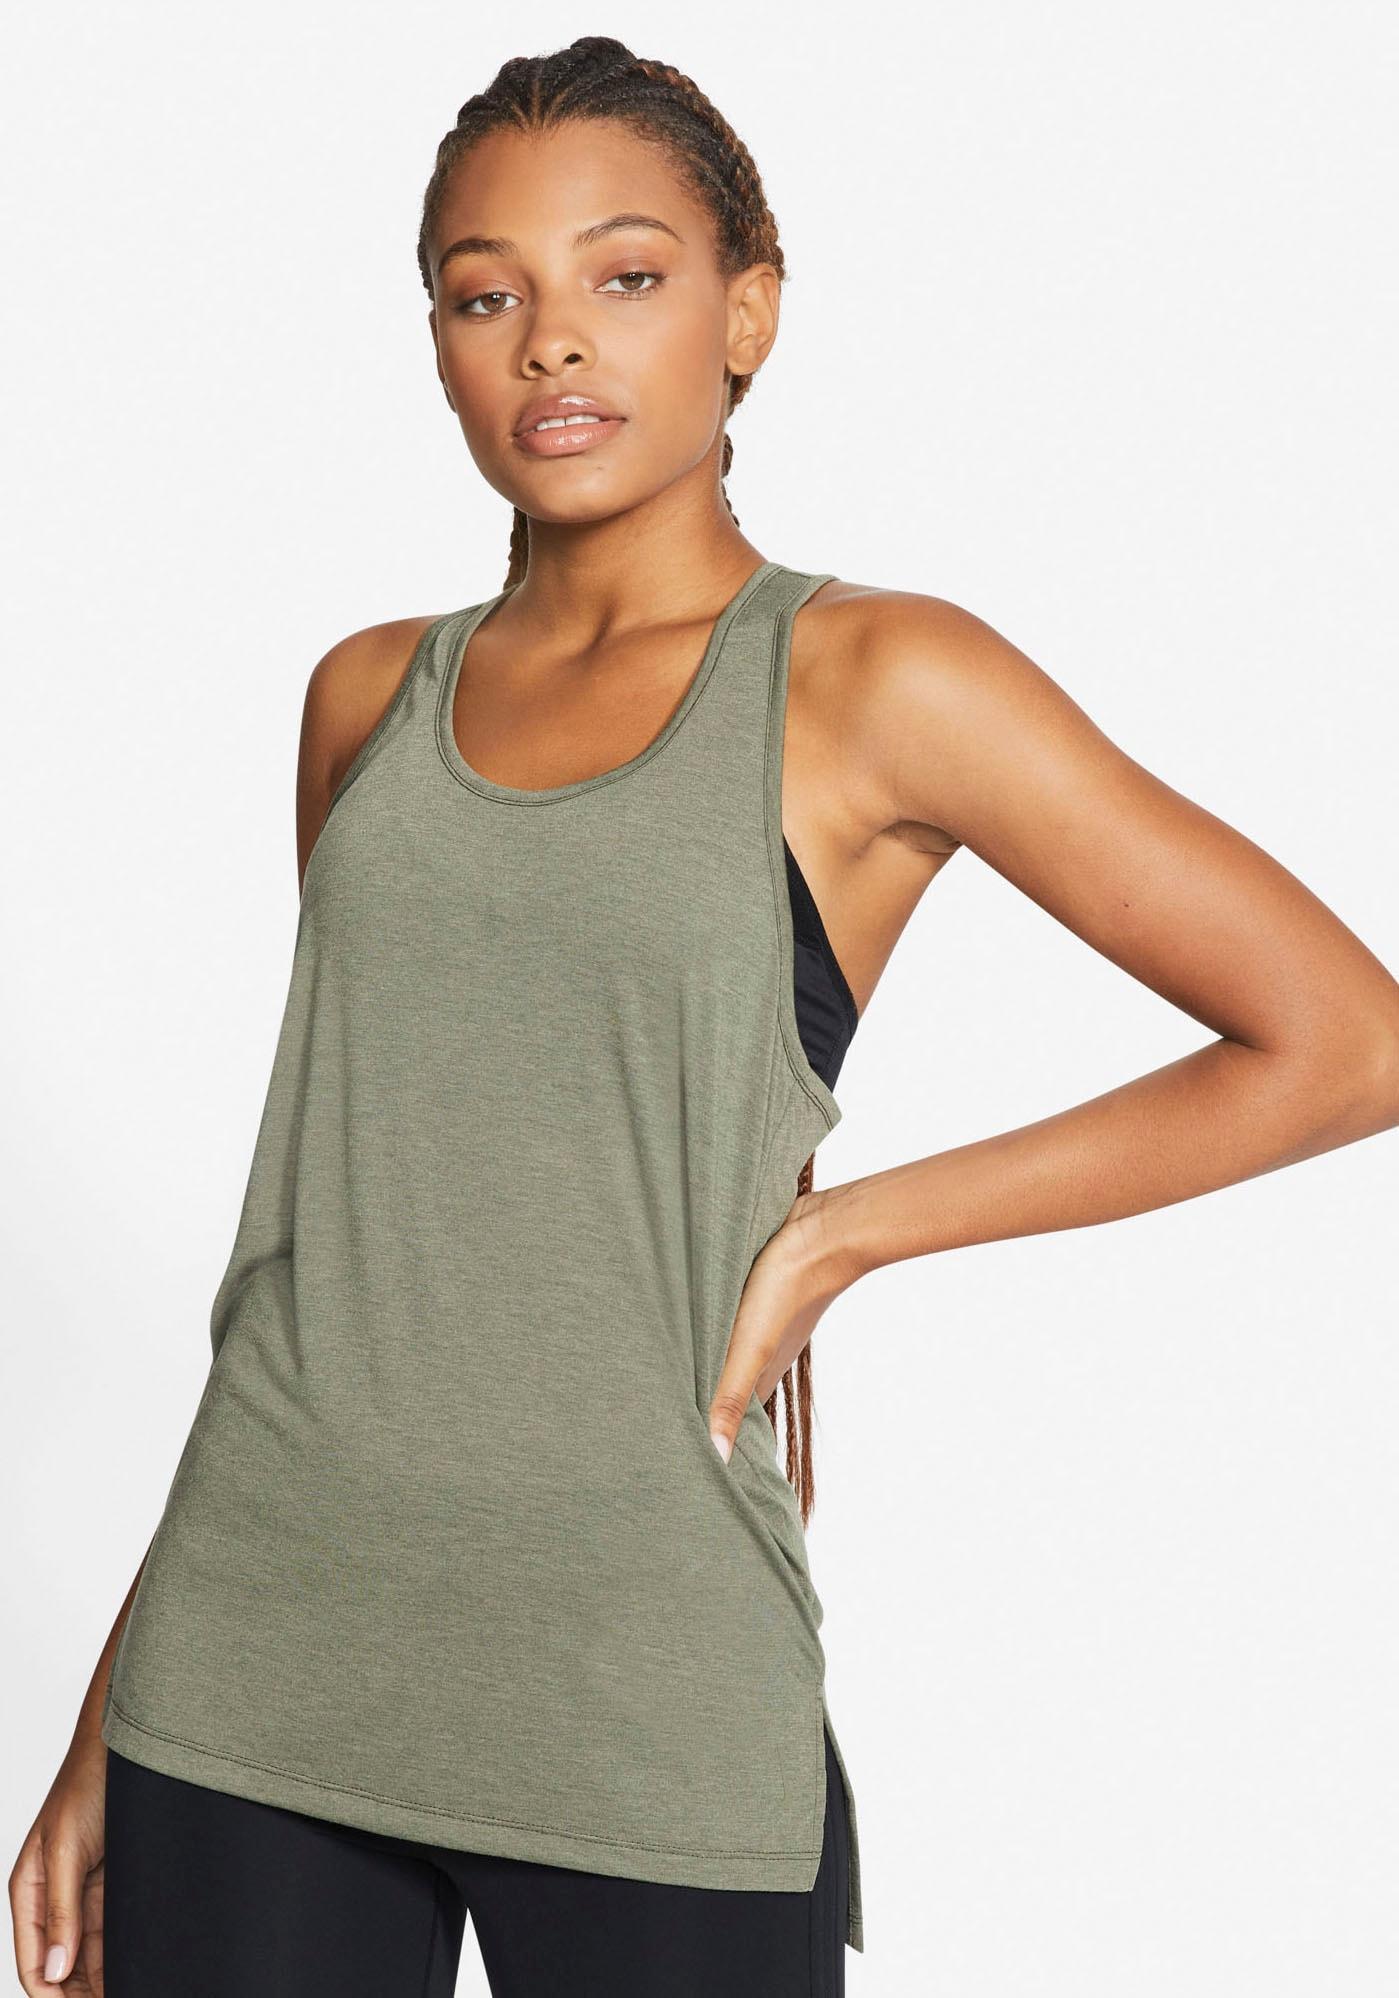 Nike Yogatop Yoga Women's Tank grün Damen Trägertops Tops